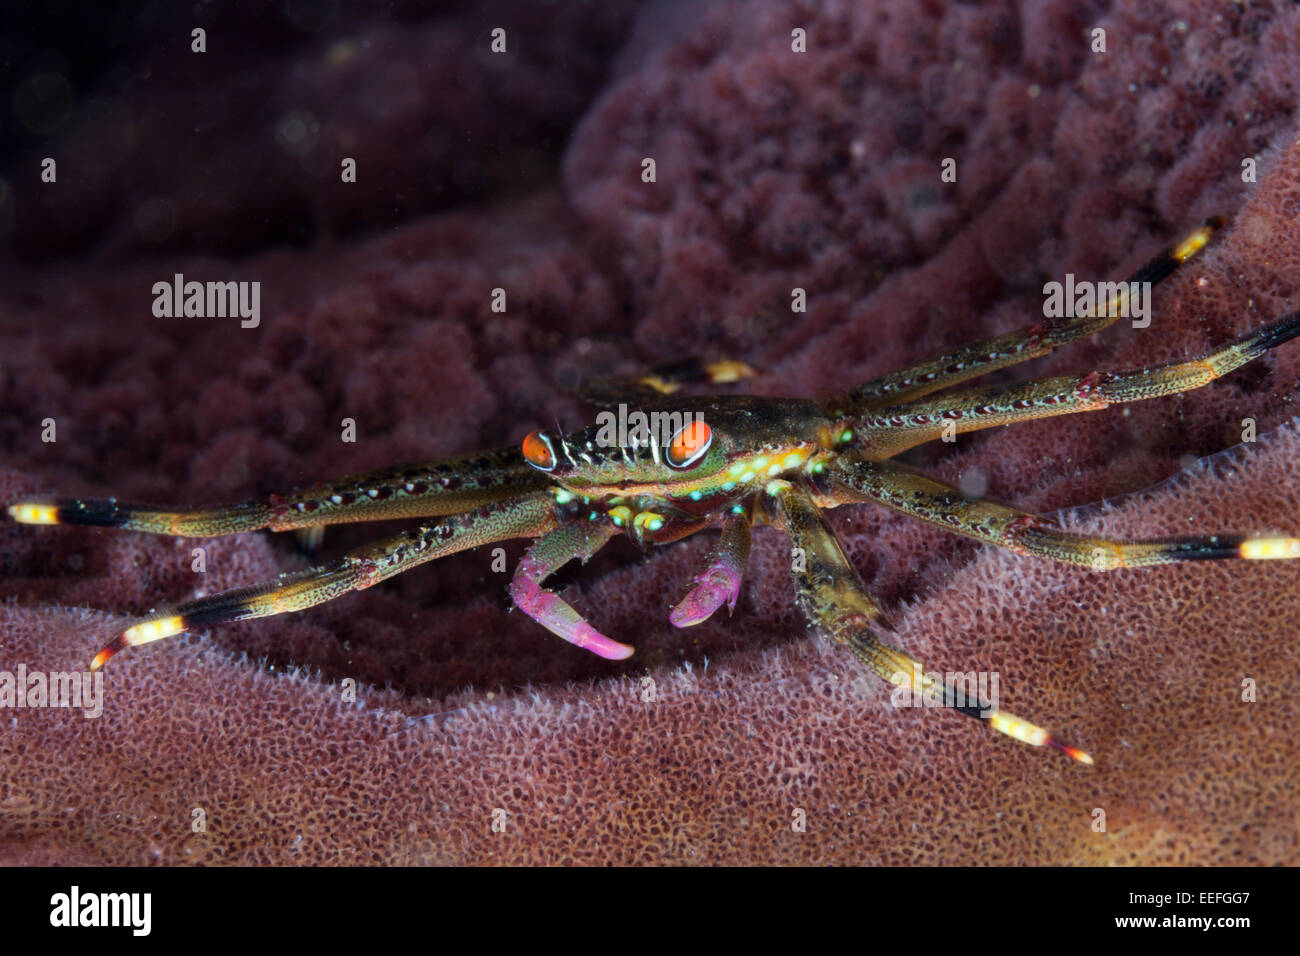 Coral Crab inside sponge, Trapezia sp., Ambon, Moluccas, Indonesia - Stock Image